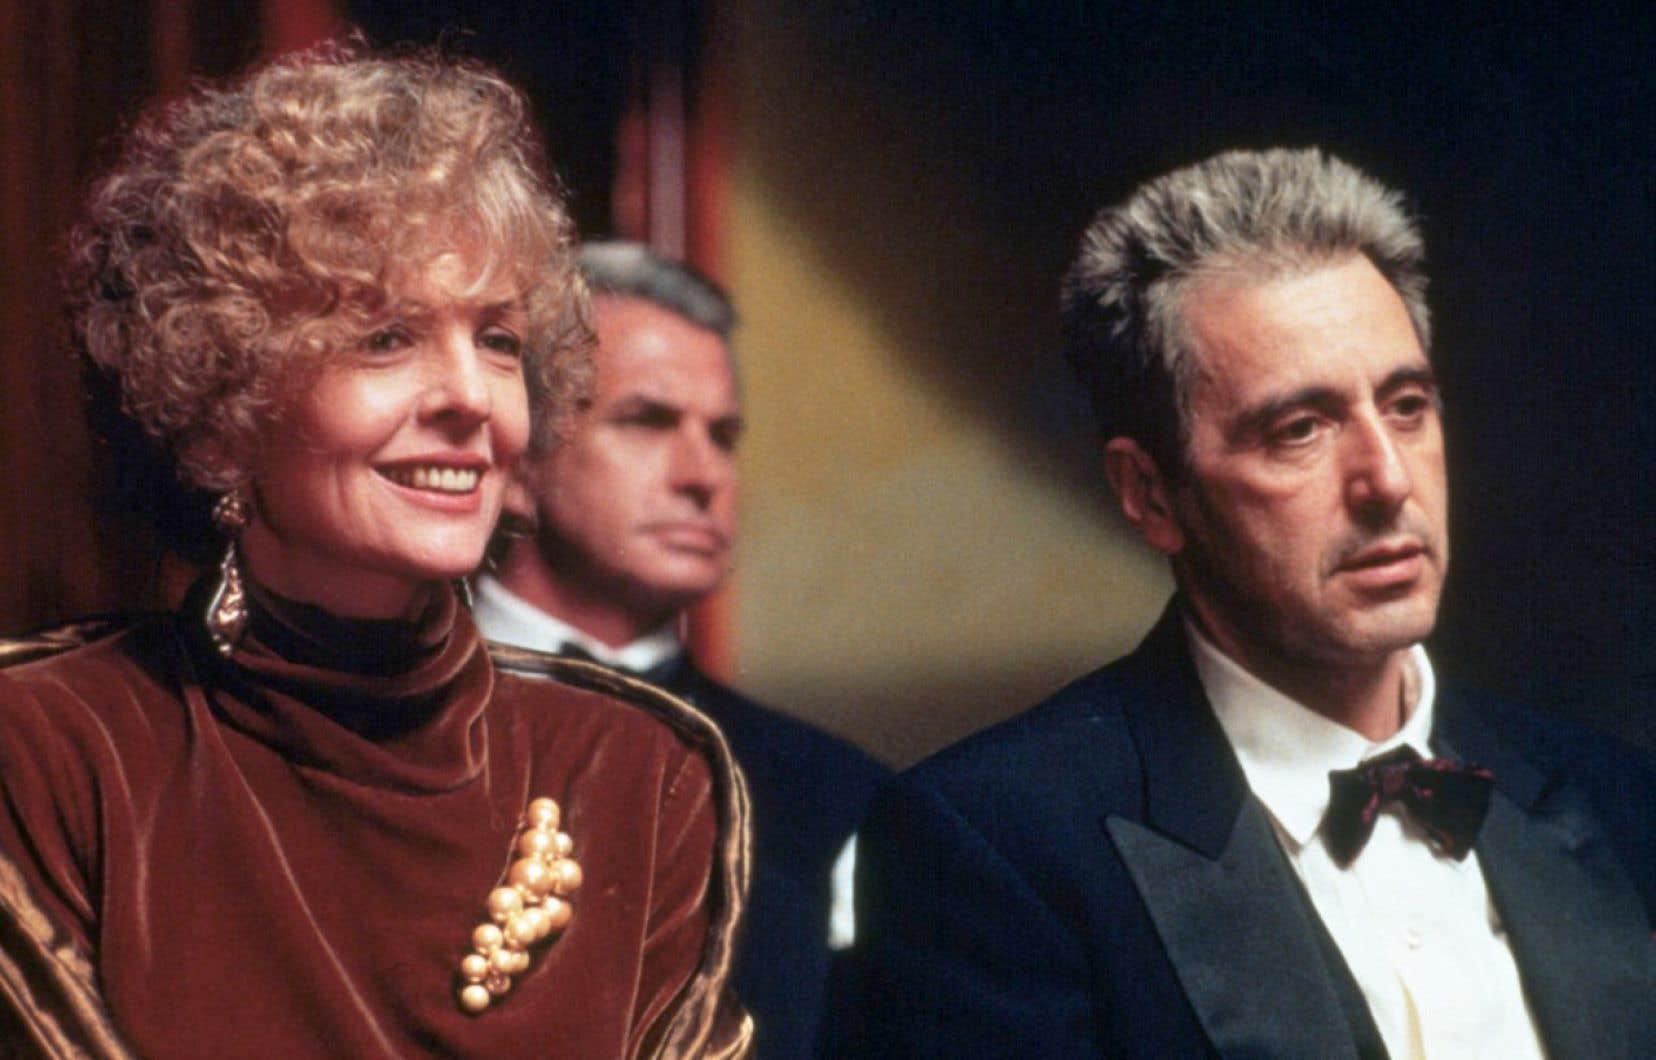 Diane Keaton, Georges Hamilton et Al Pacino dans The Godfather, Coda: the Death of Michael Corleone